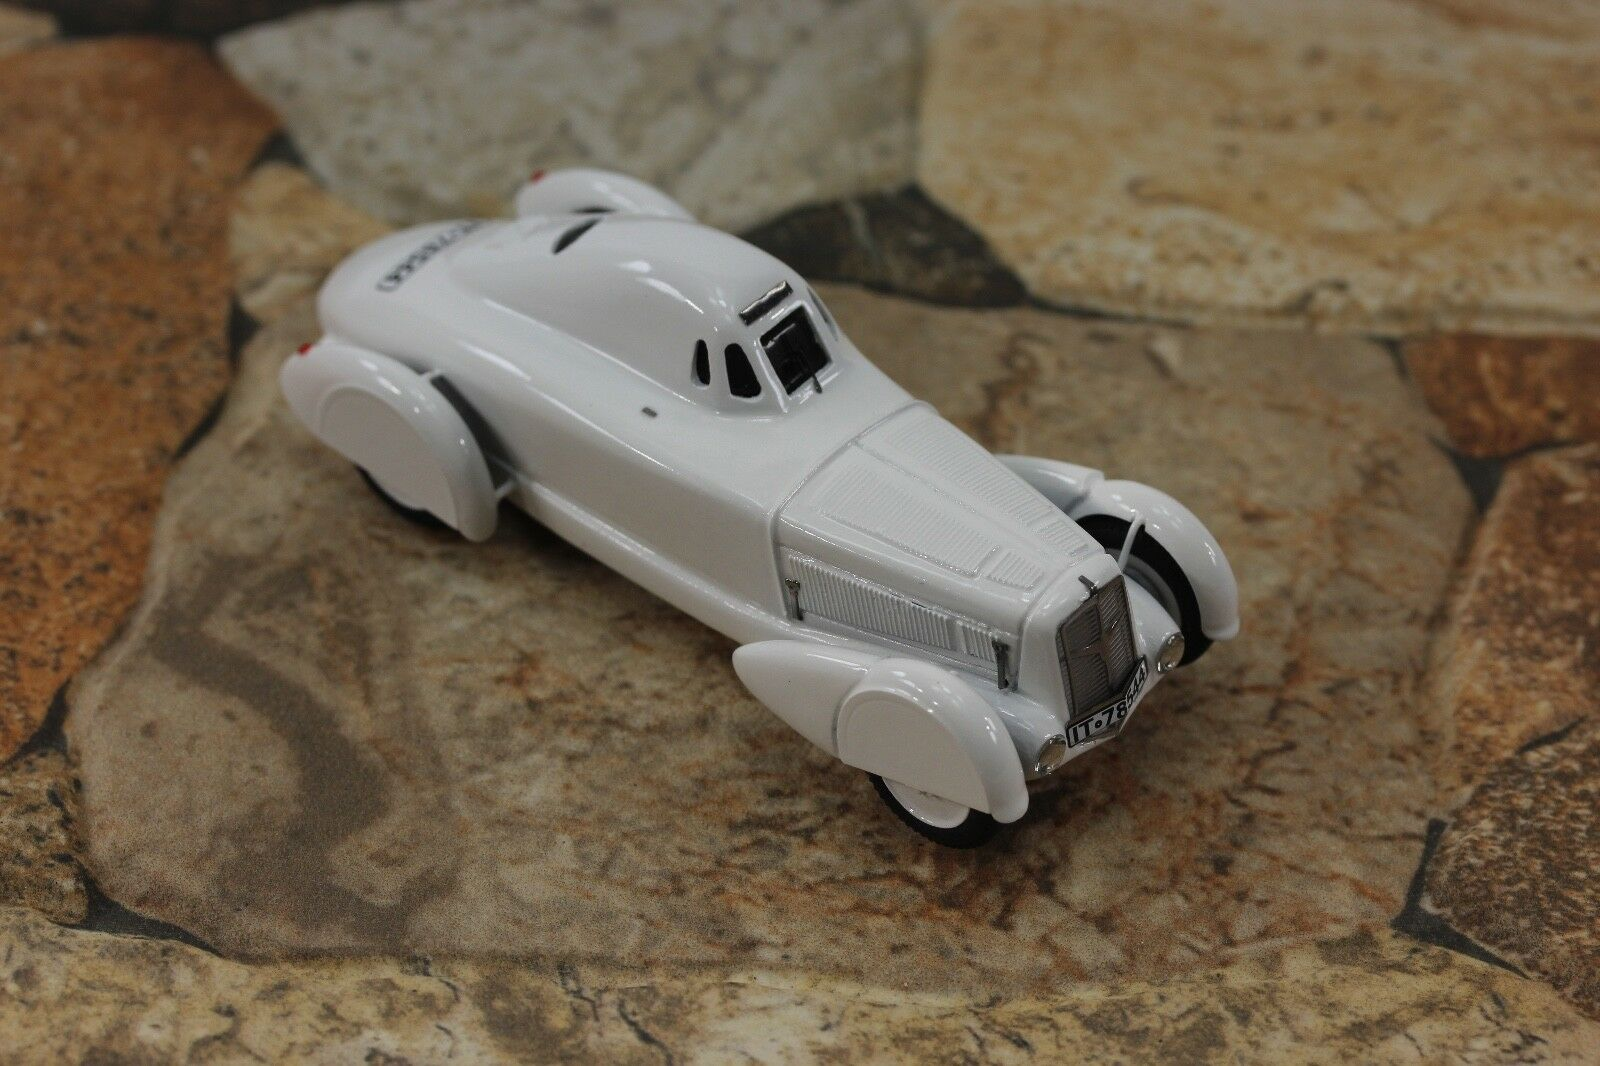 Adler Trumpf junior Sport 1935 LSR rekordwagen auto Pioneer r1 only 50 pieces